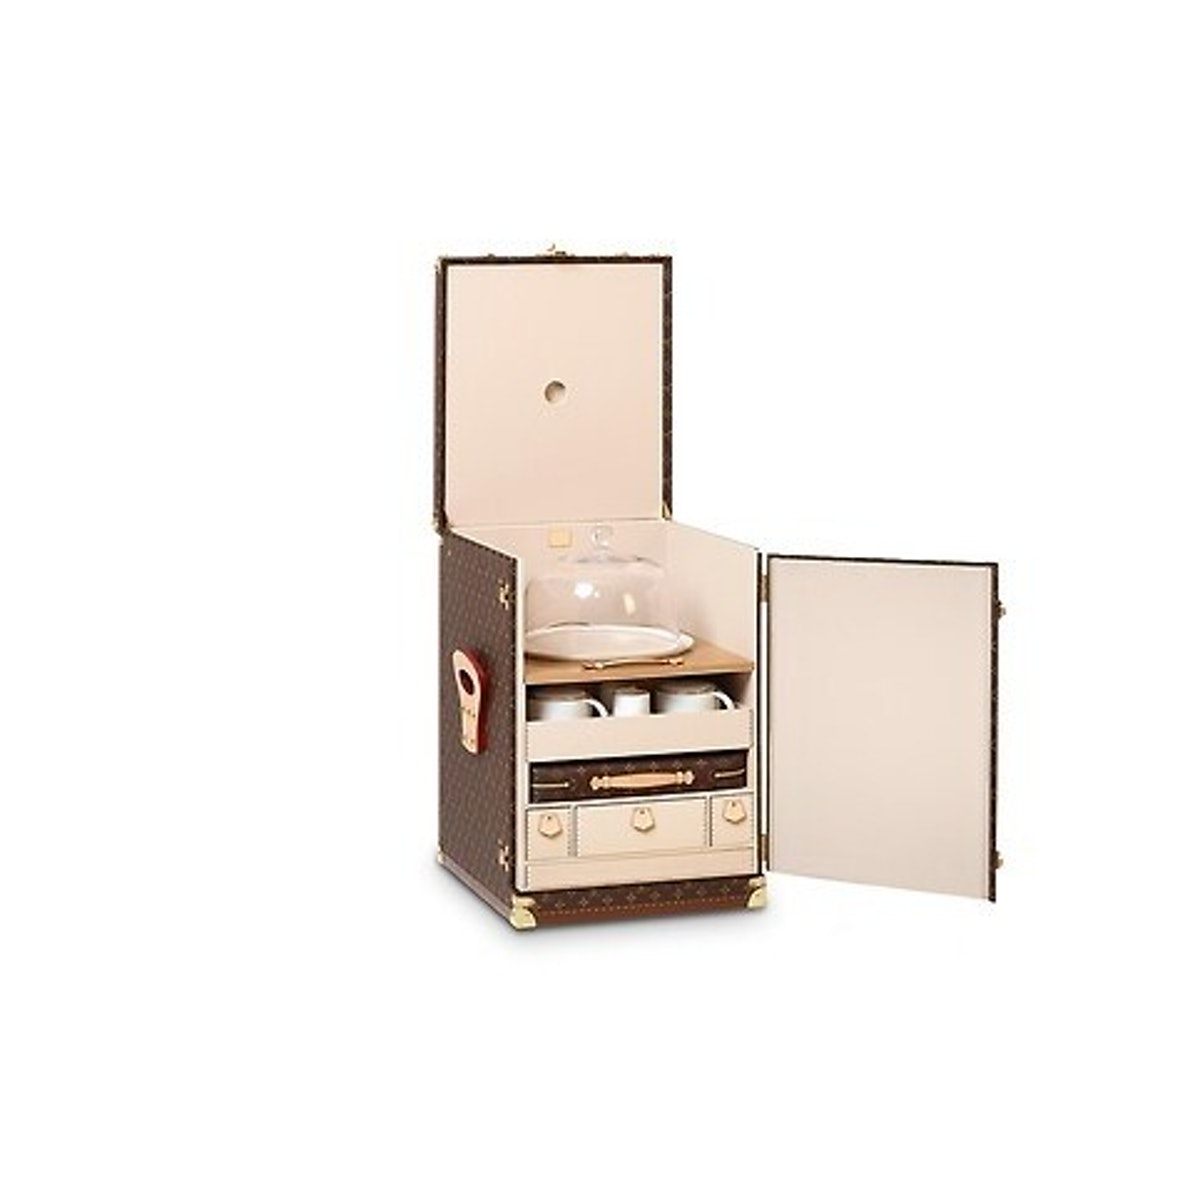 louis-vuitton-afternoon-tea-box-monogram-travel--M20092_PM1_Interior view.jpg